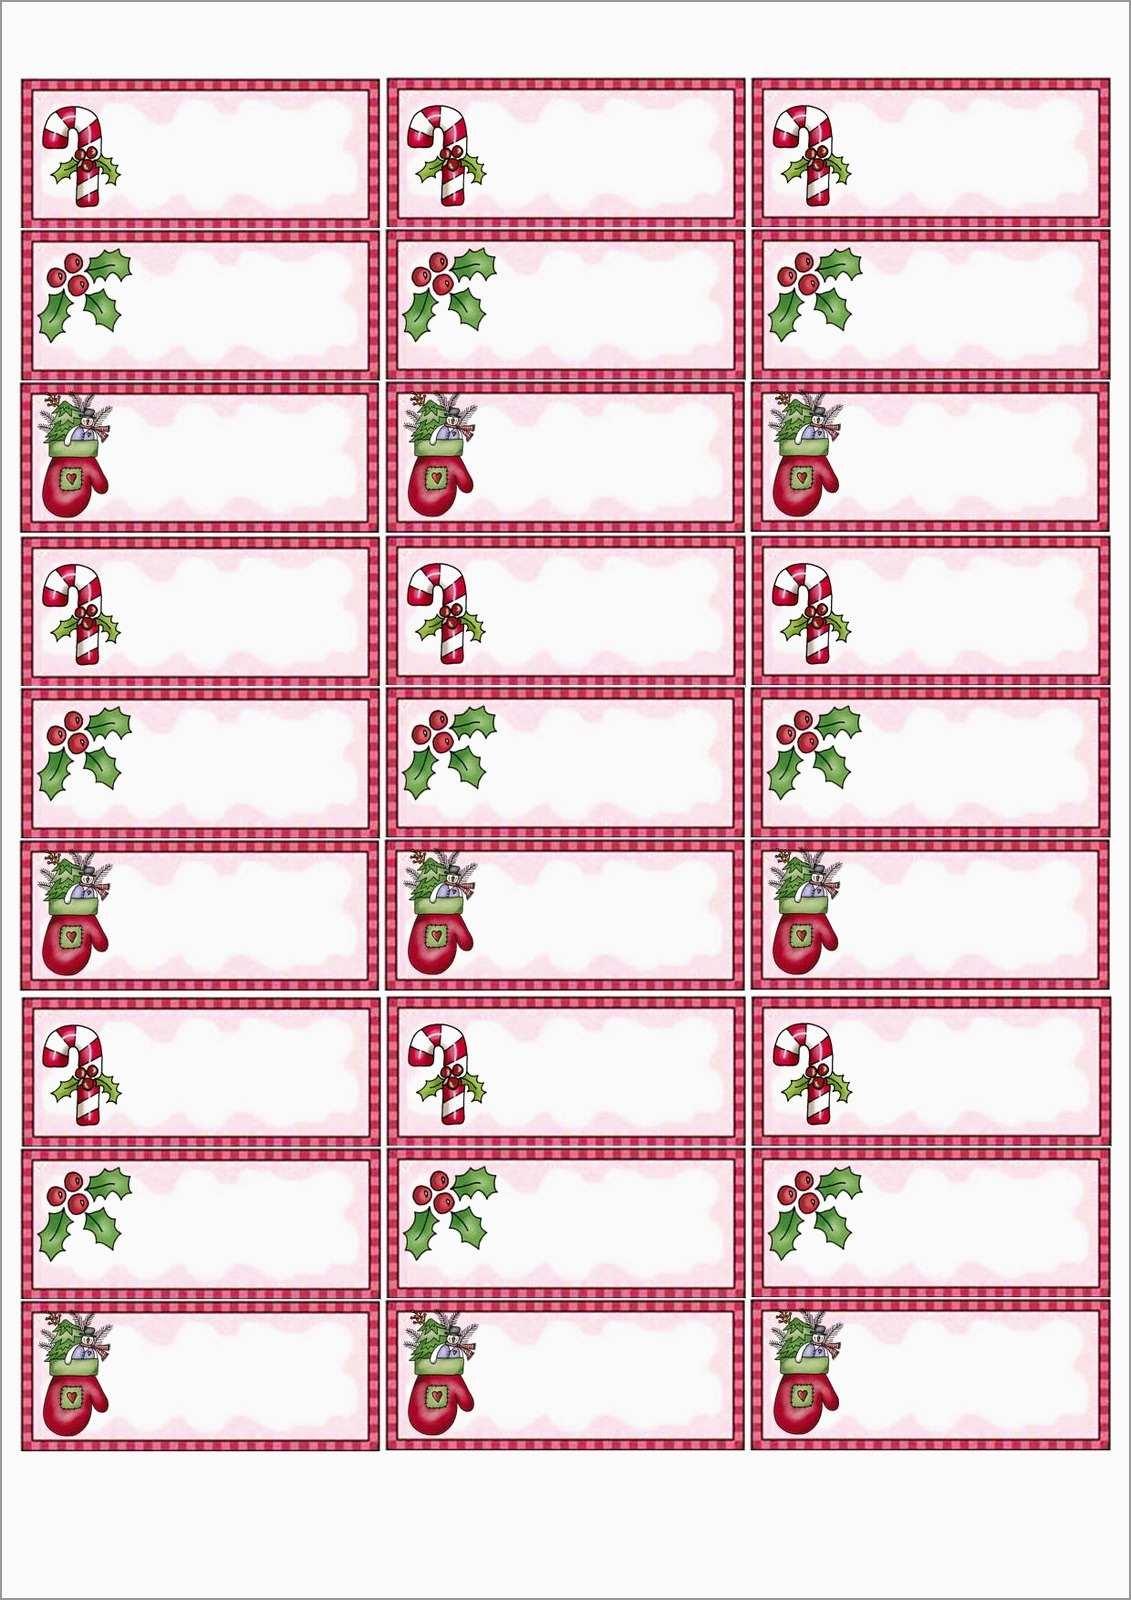 Beautiful Christmas Address Labels Free Templates | Best Of Template - Free Printable Christmas Address Labels Avery 5160